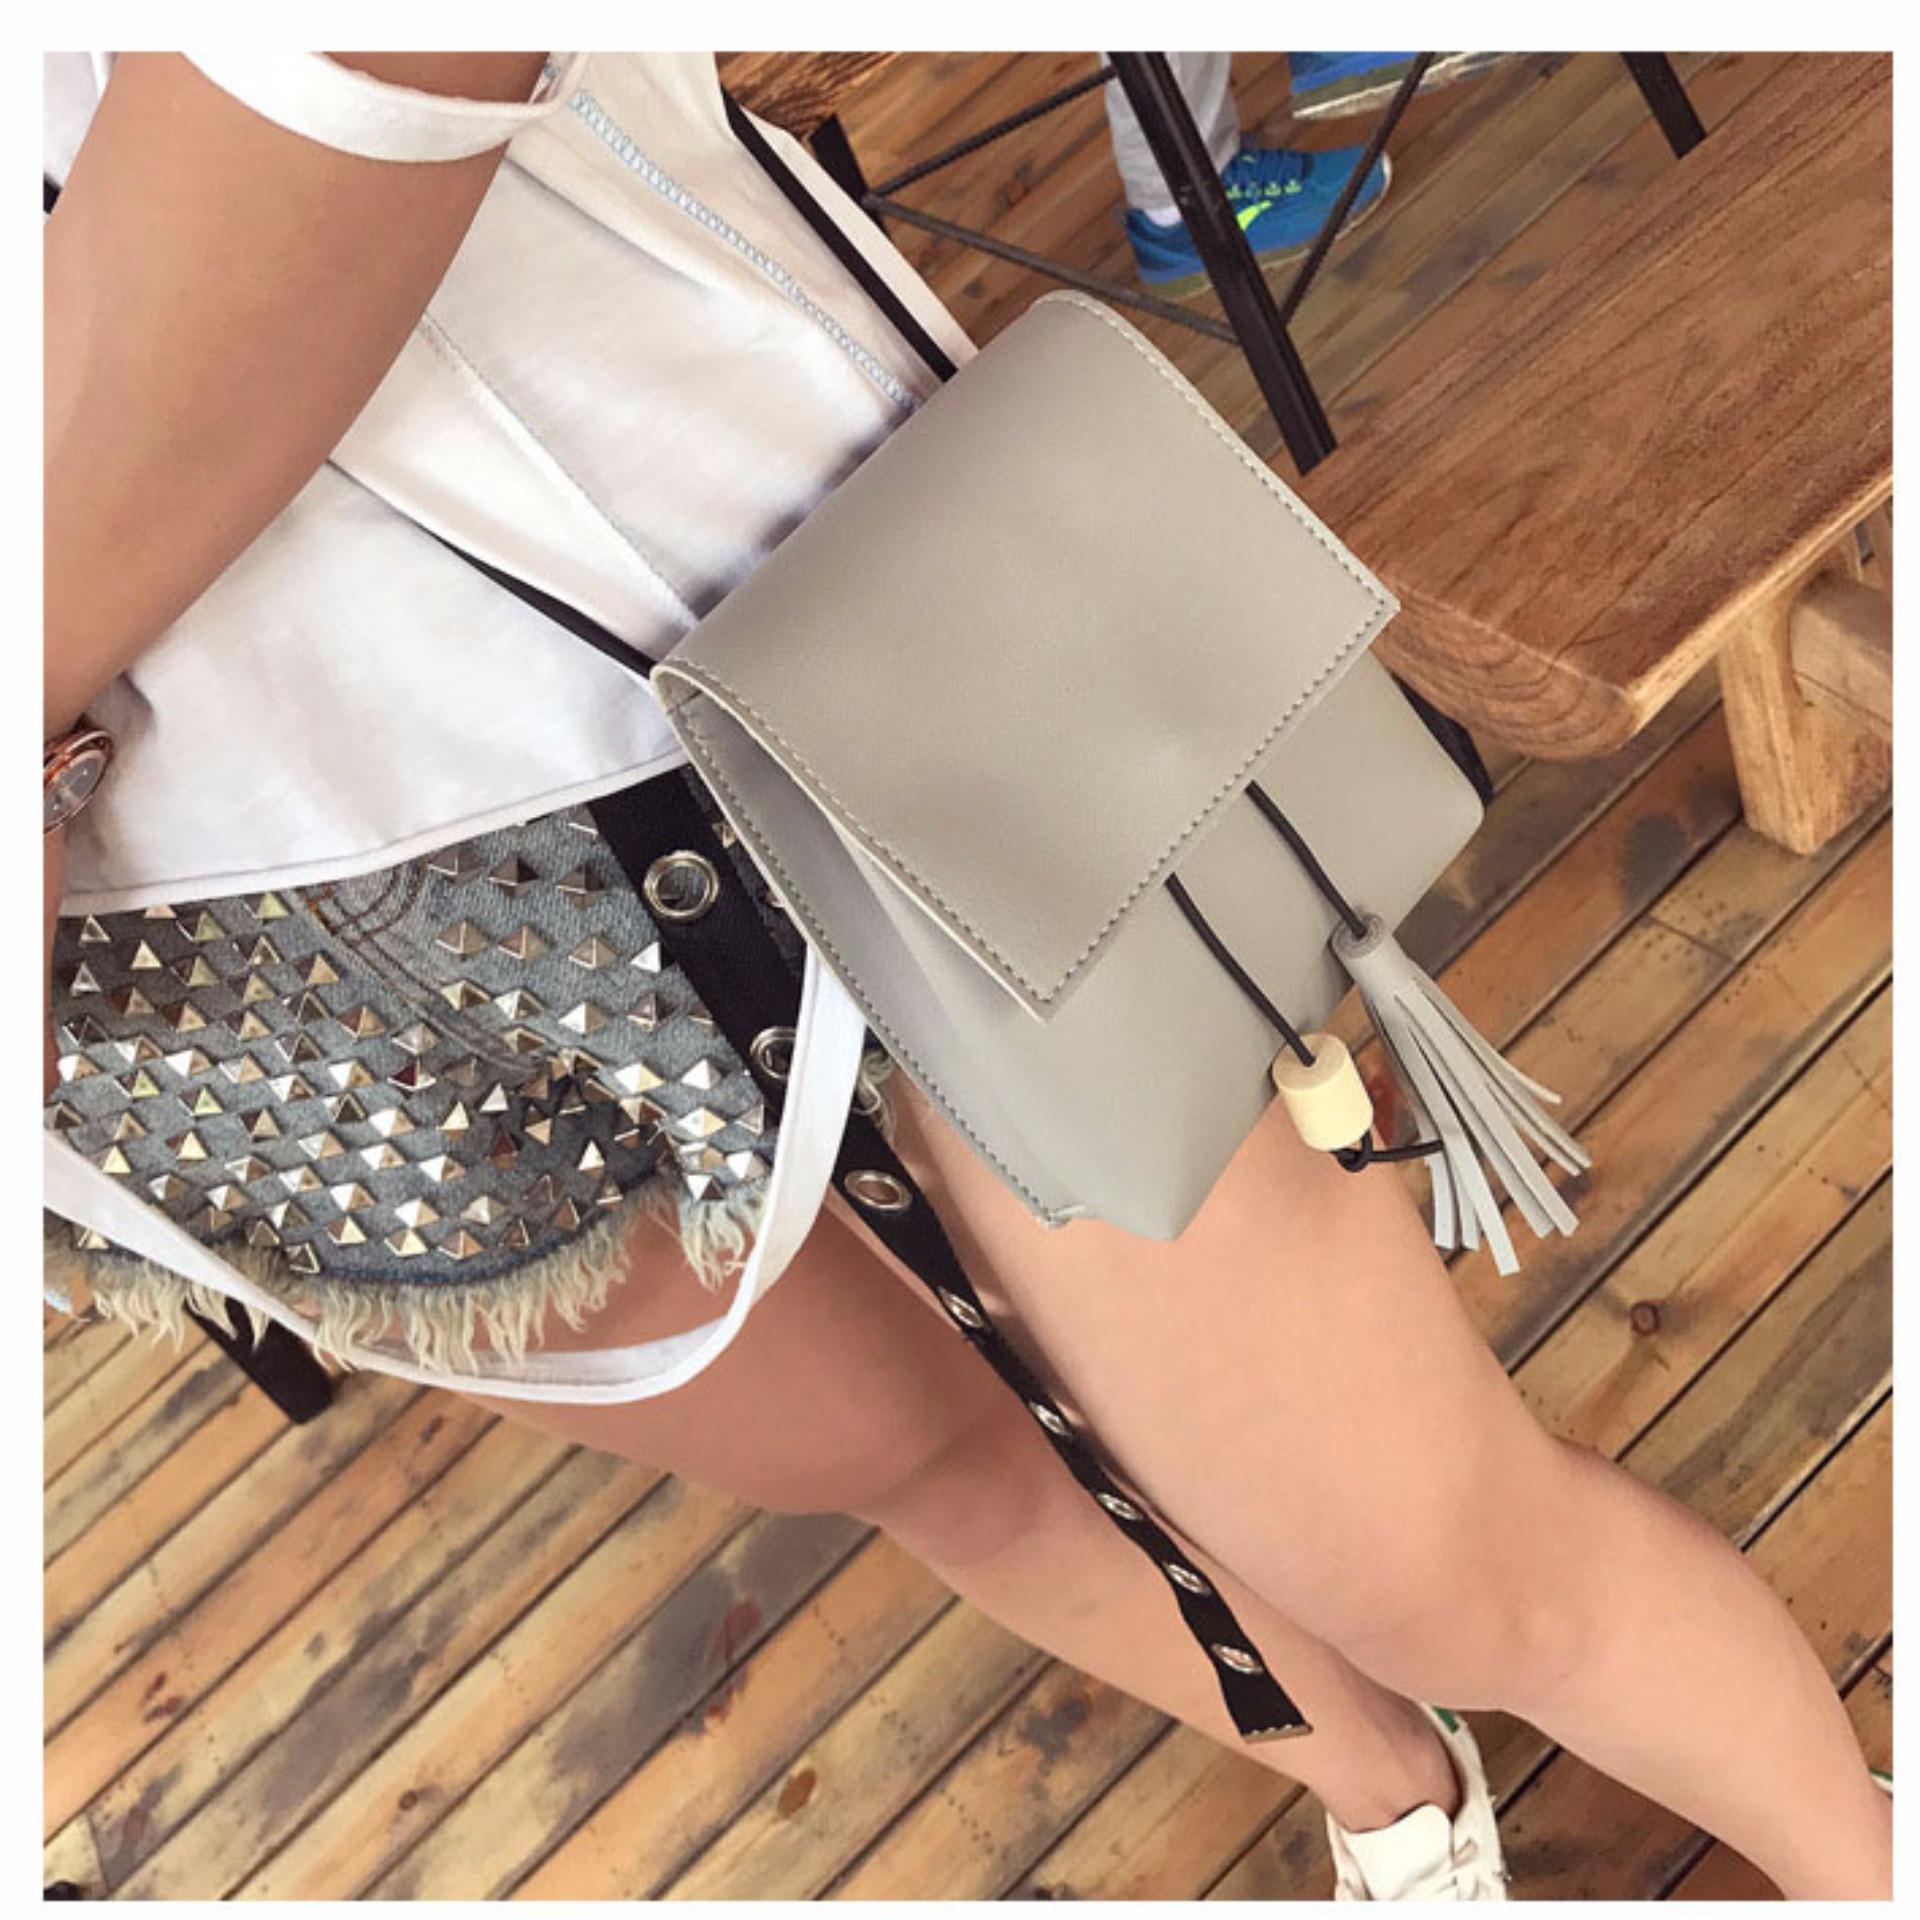 Harga Hangkingkong Tas Selempang Wanita Mini Sling Bag Korean Style Grey Abu Abu Satu Set